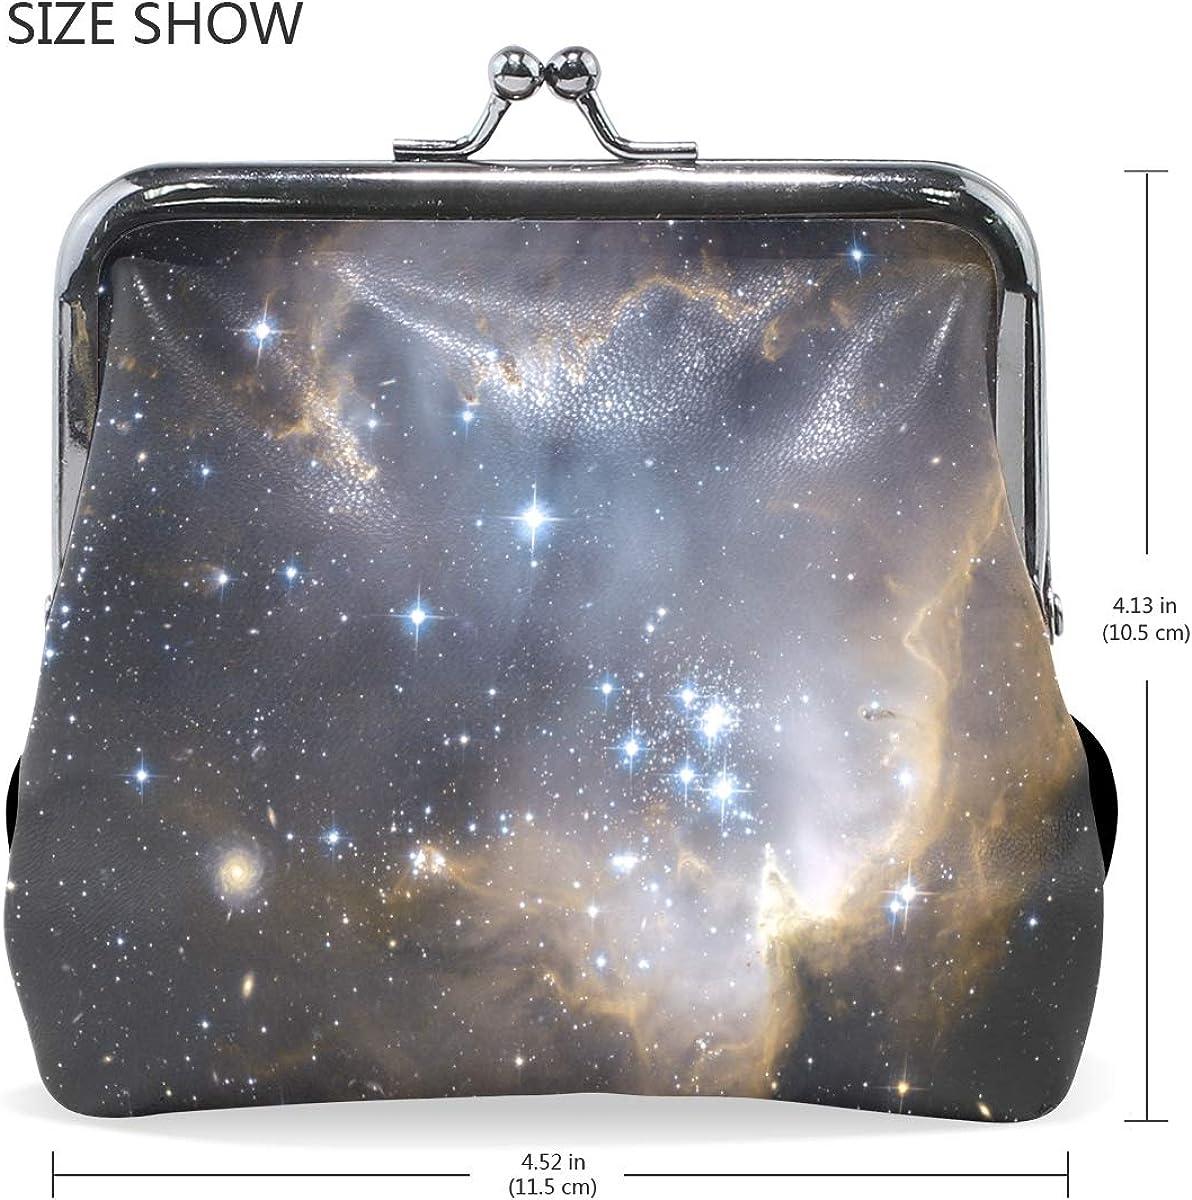 Fashion Womens Coin Purse Nebula Star Space Vintage Pouch Mini Purse Wallets